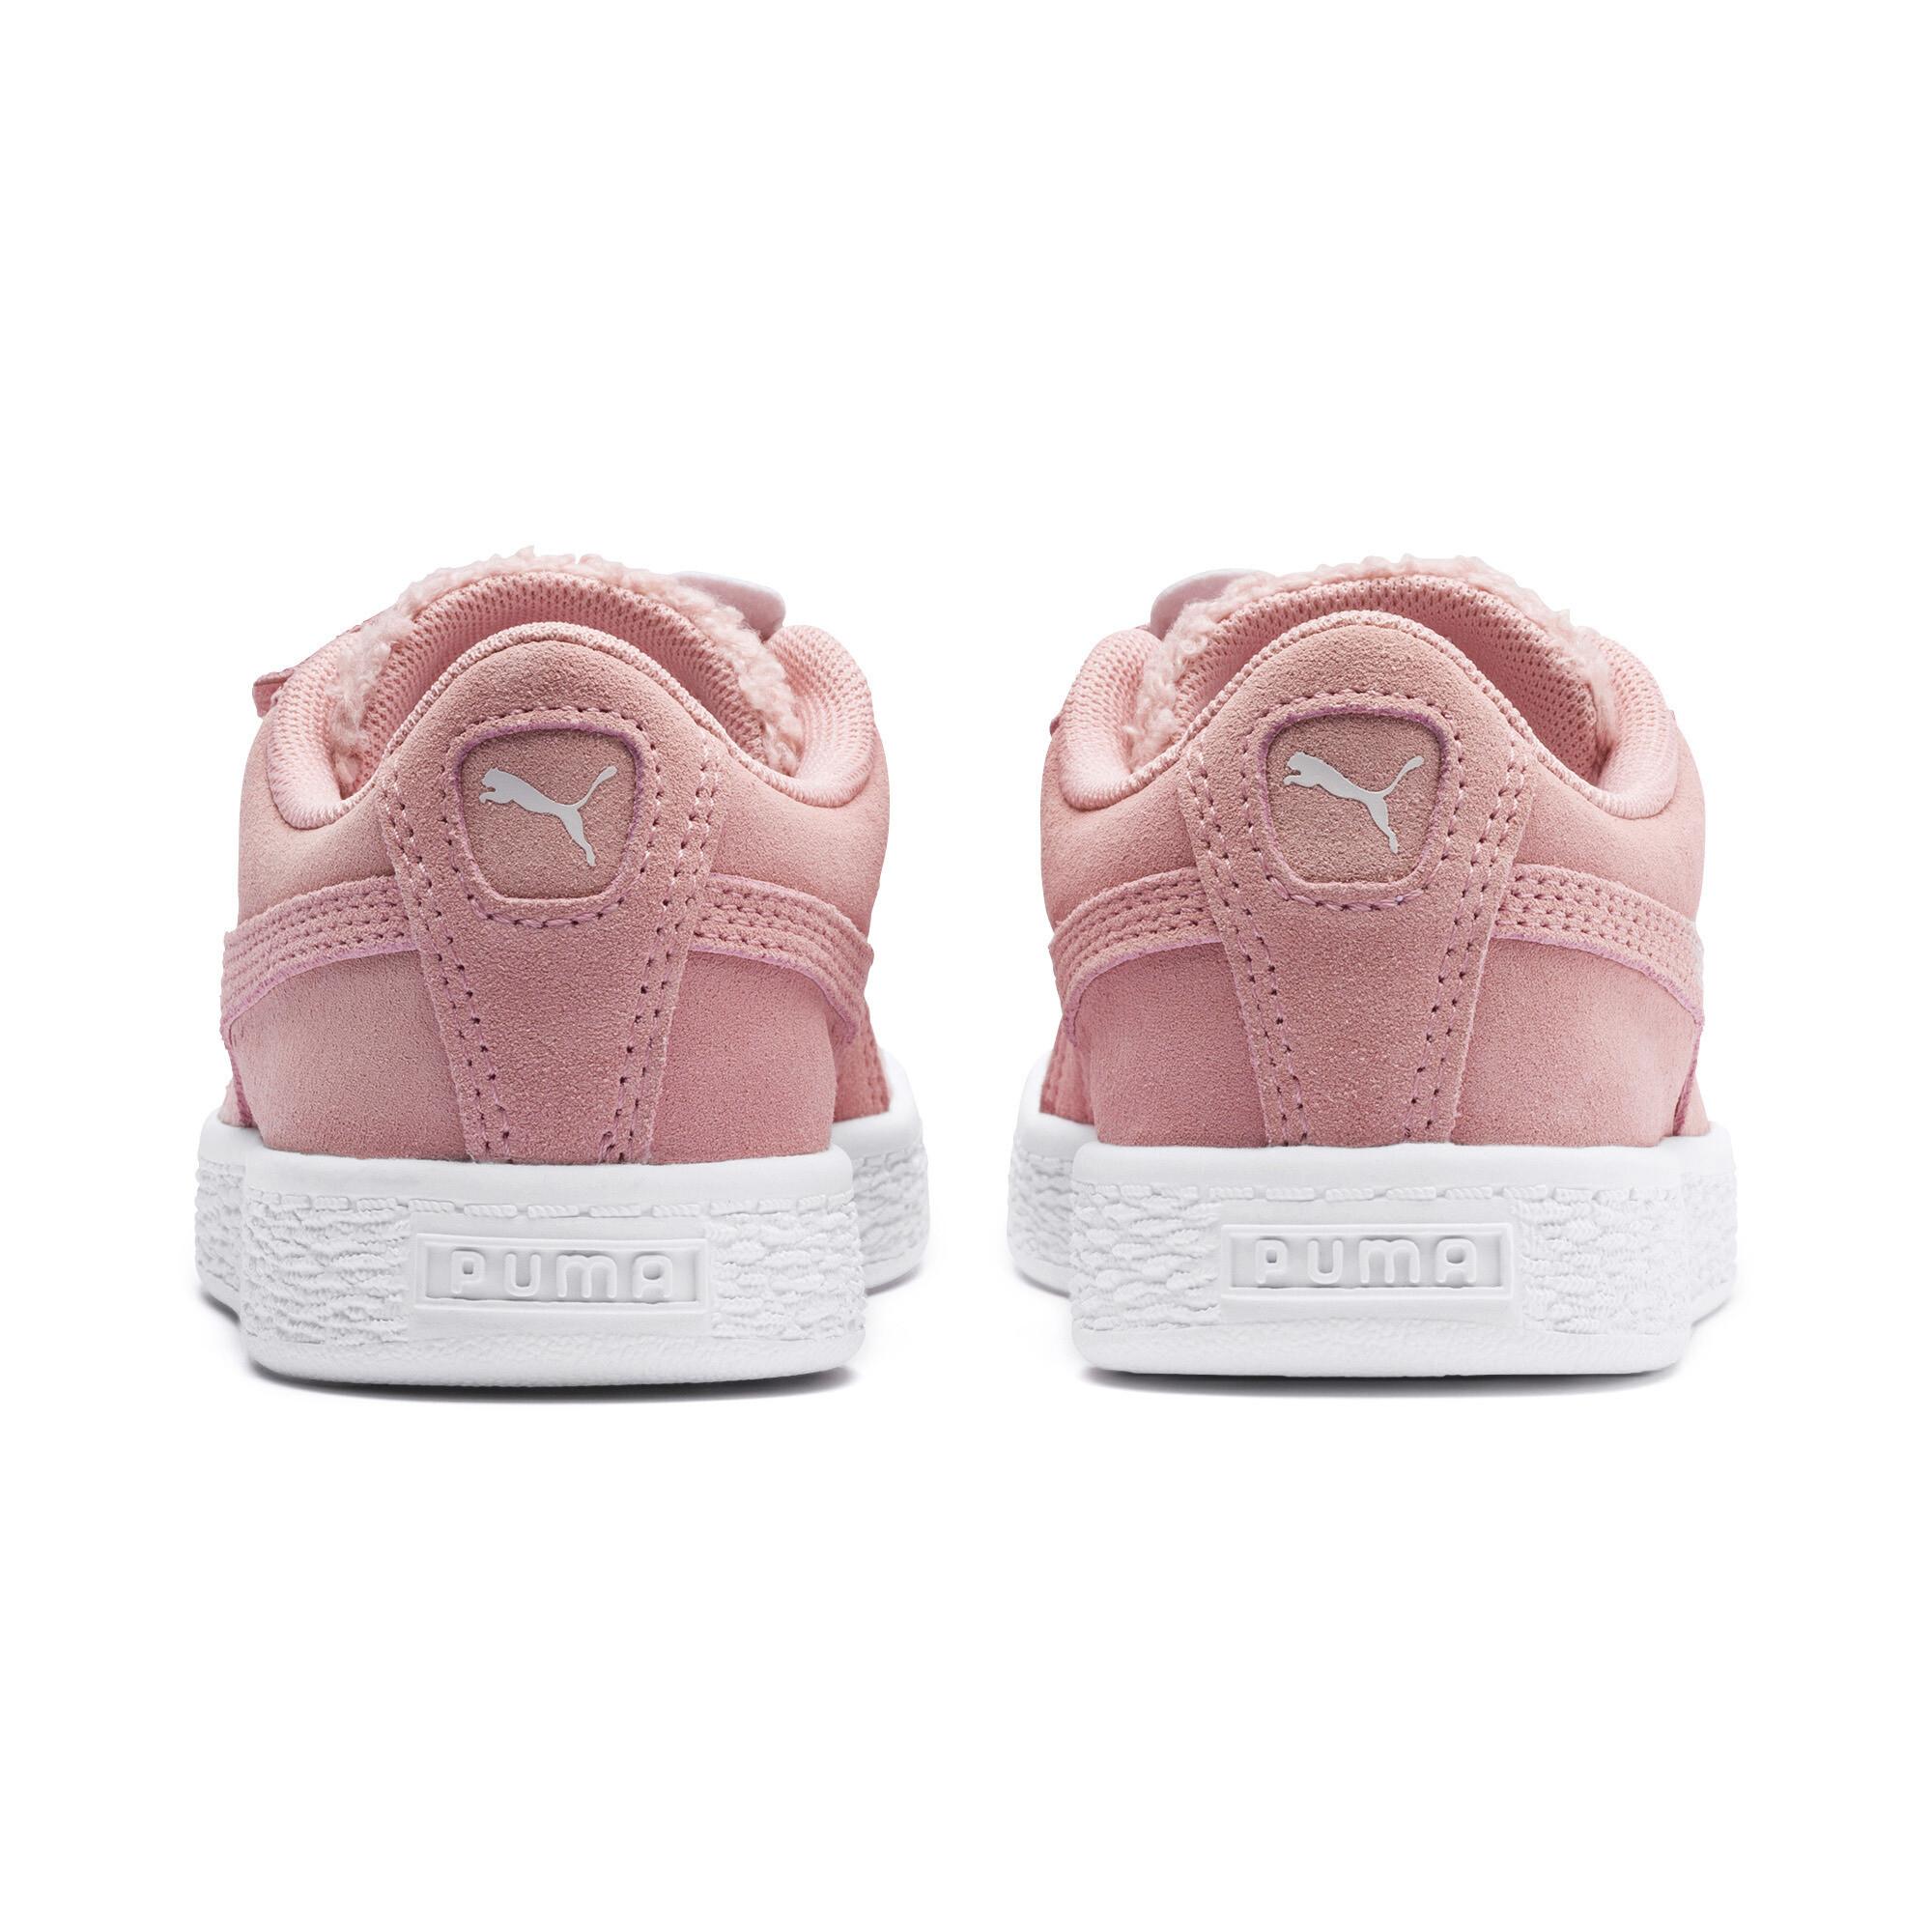 PUMA-Suede-Winter-Monster-Little-Kids-039-Shoes-Kids-Shoe-Kids thumbnail 3